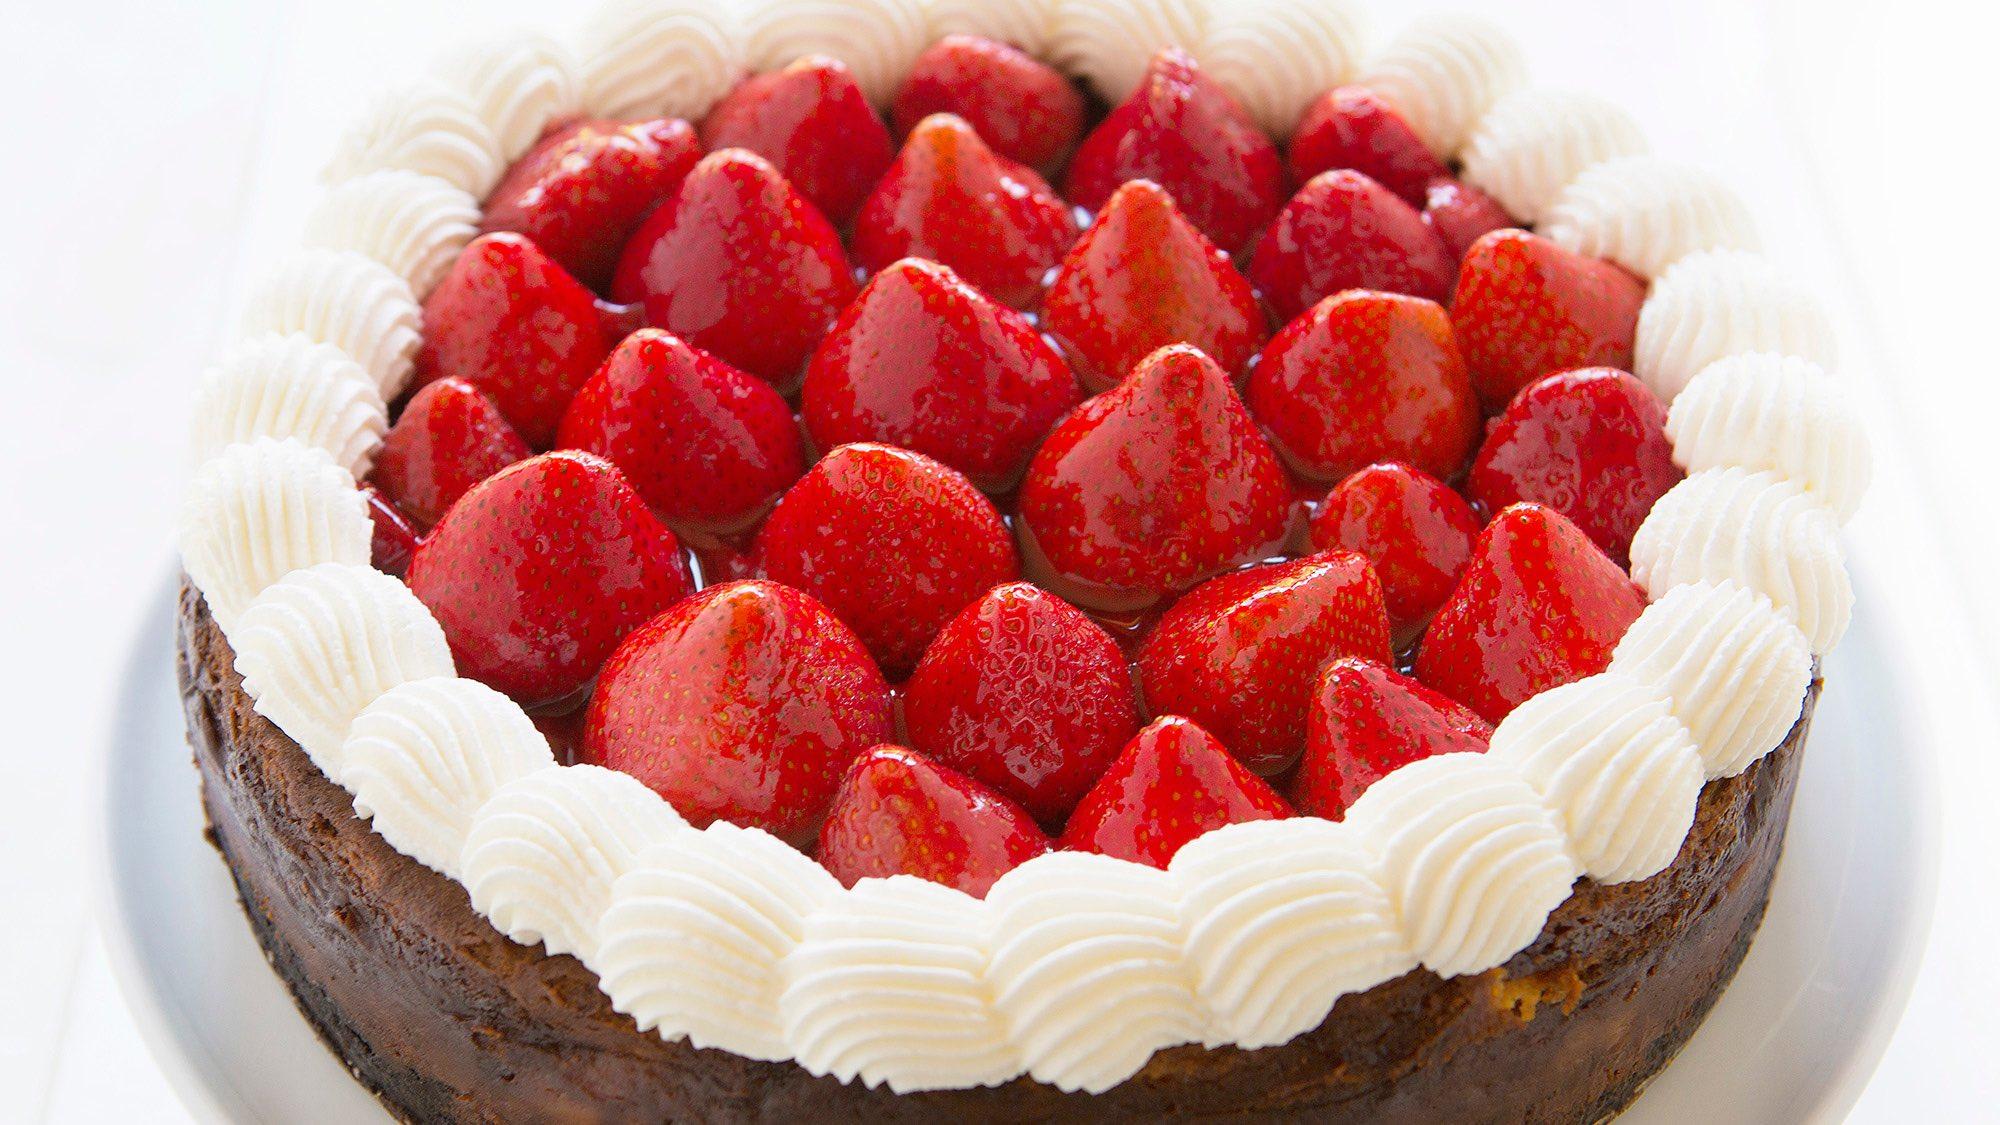 McCormick Strawberry Cheesecake